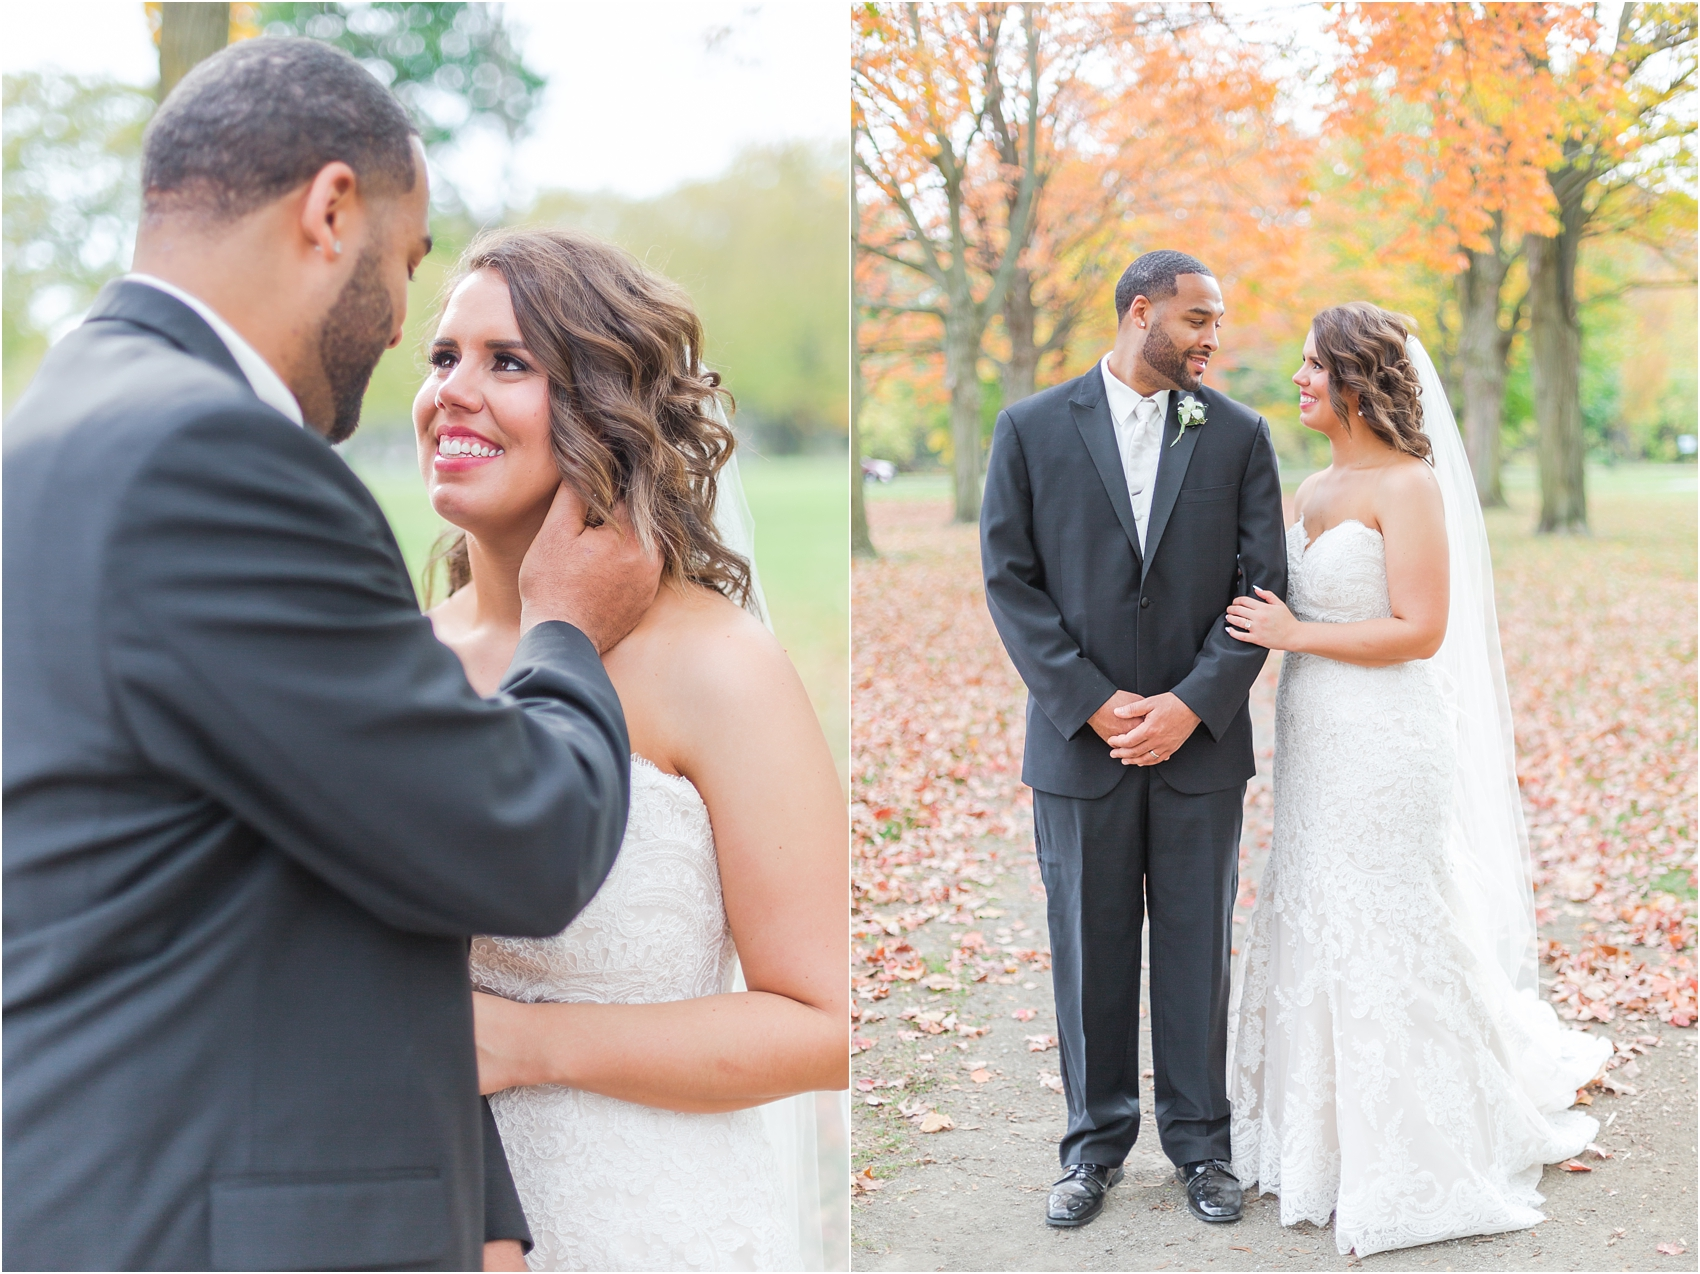 elegant-and-romantic-fall-wedding-photos-at-st-marys-catholic-church-in-monroe-michigan-by-courtney-carolyn-photography_0038.jpg